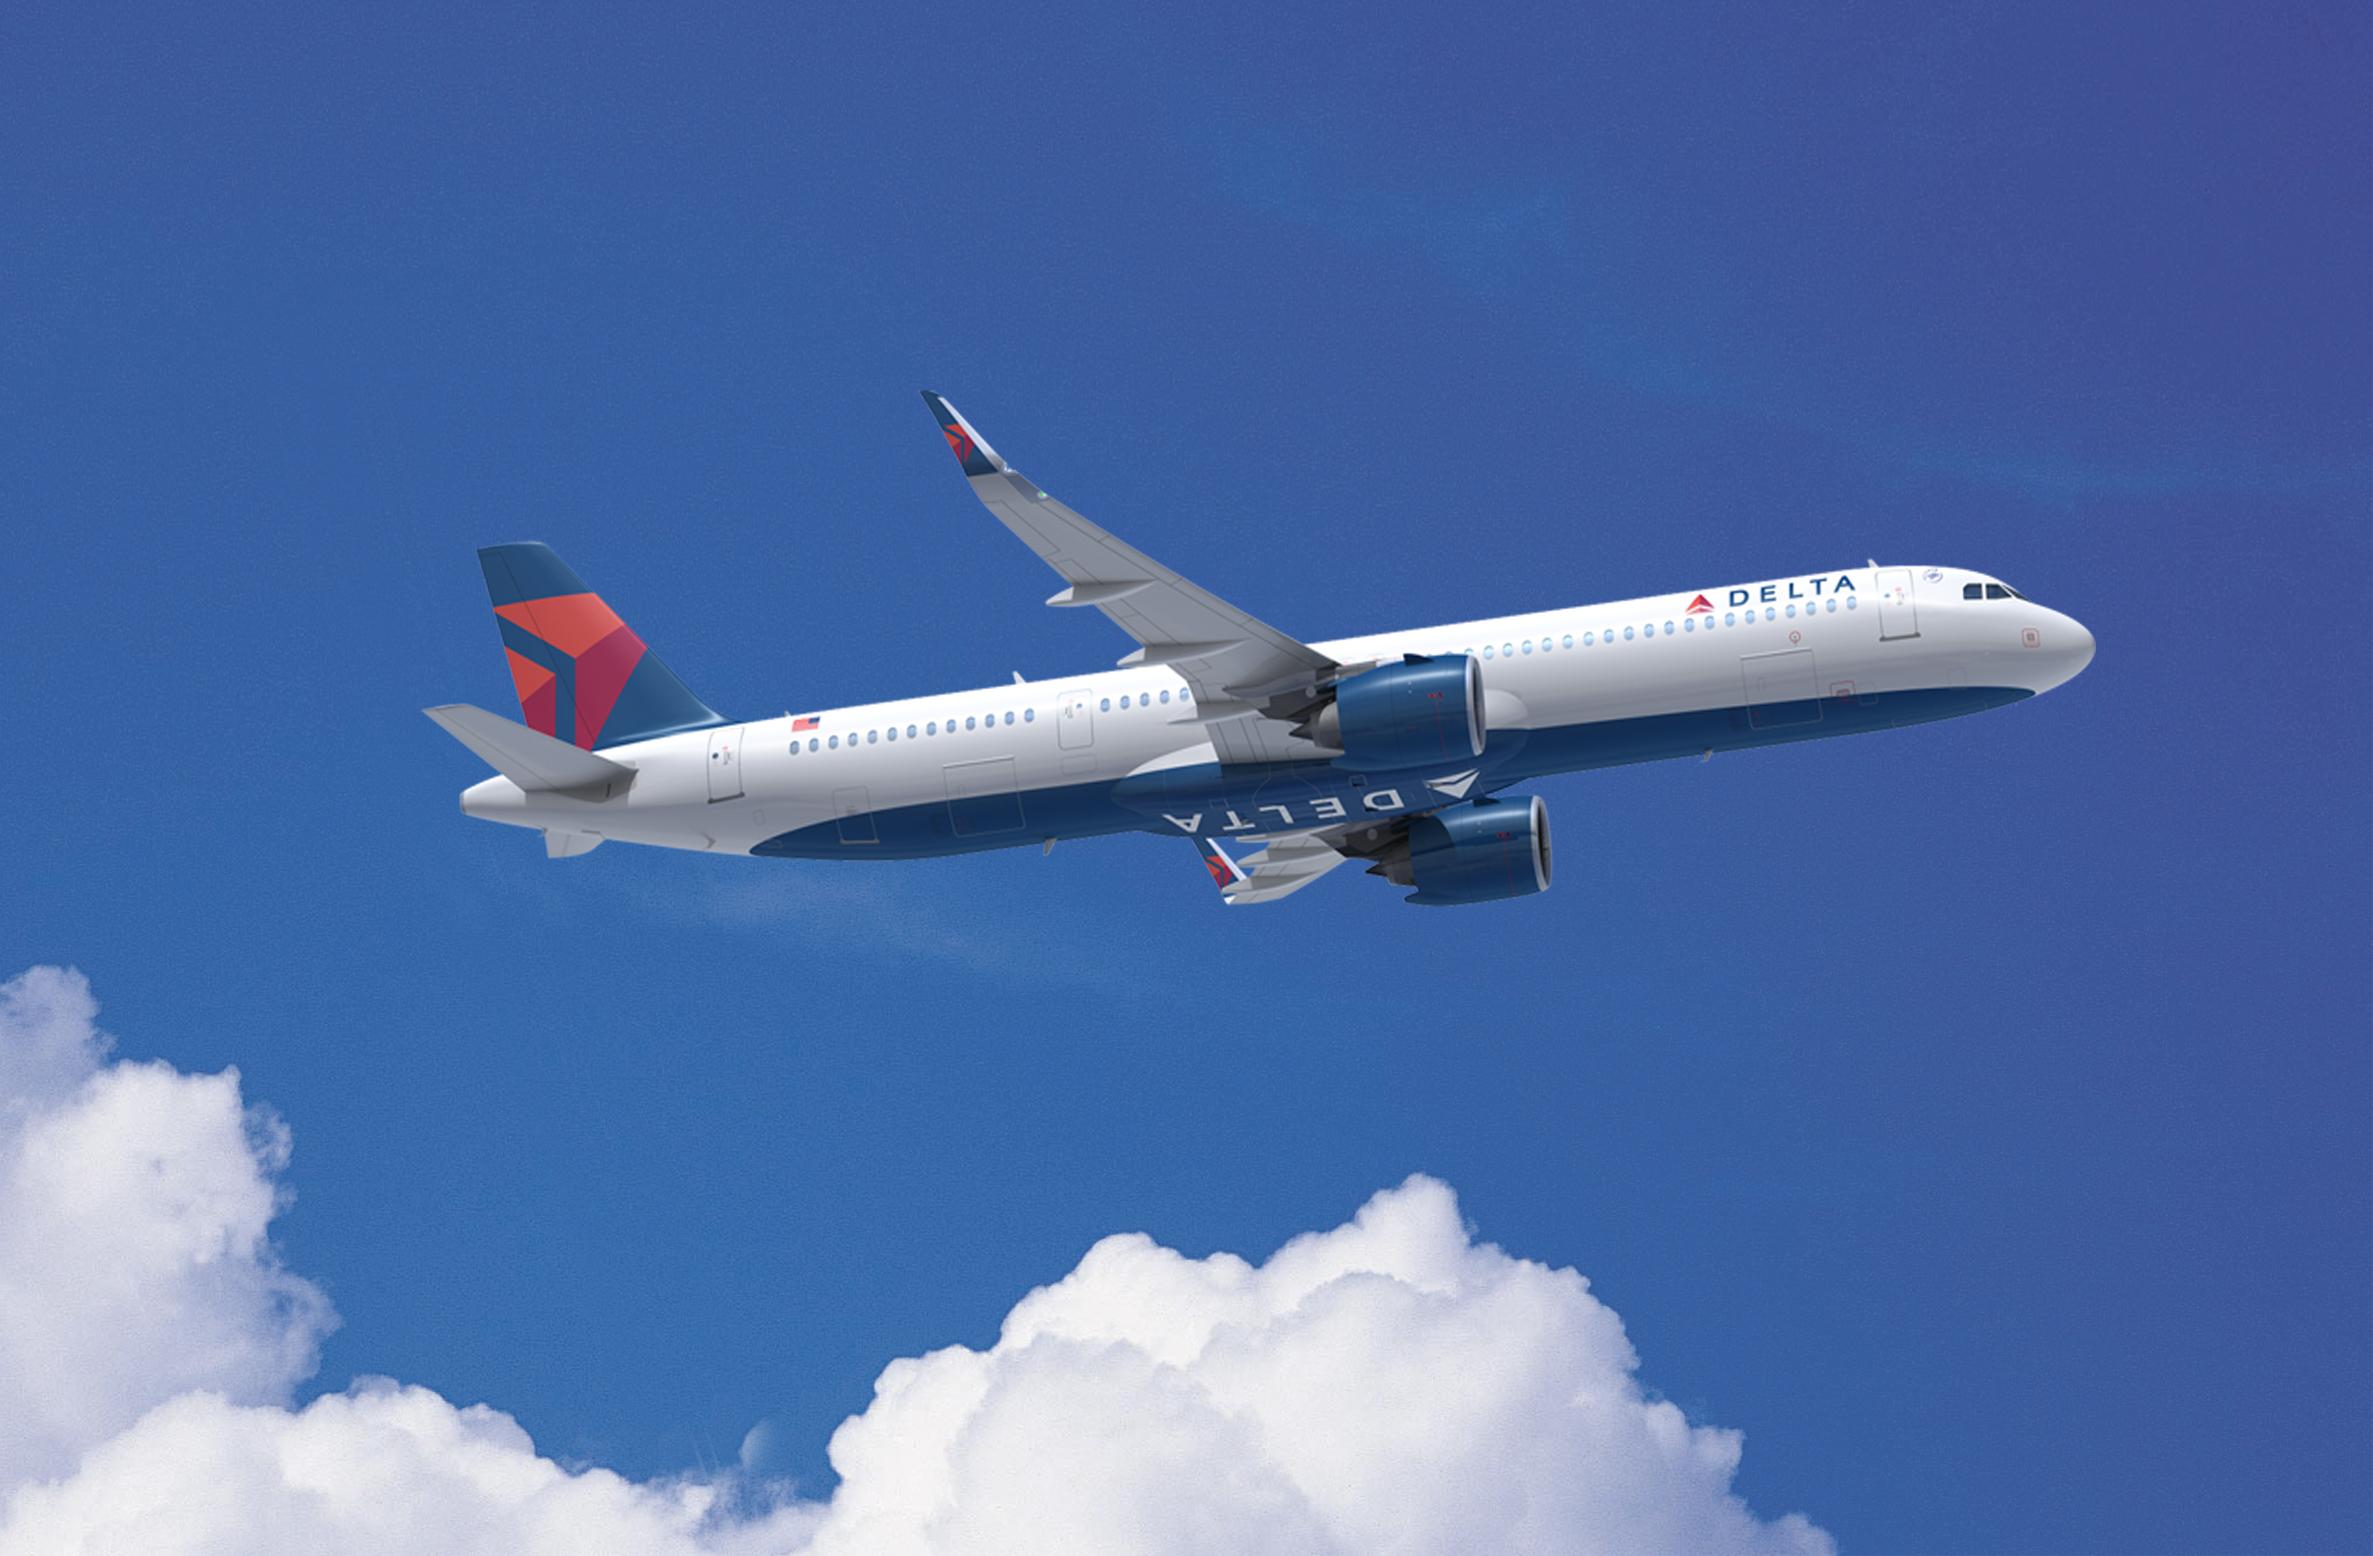 Delta A321neo